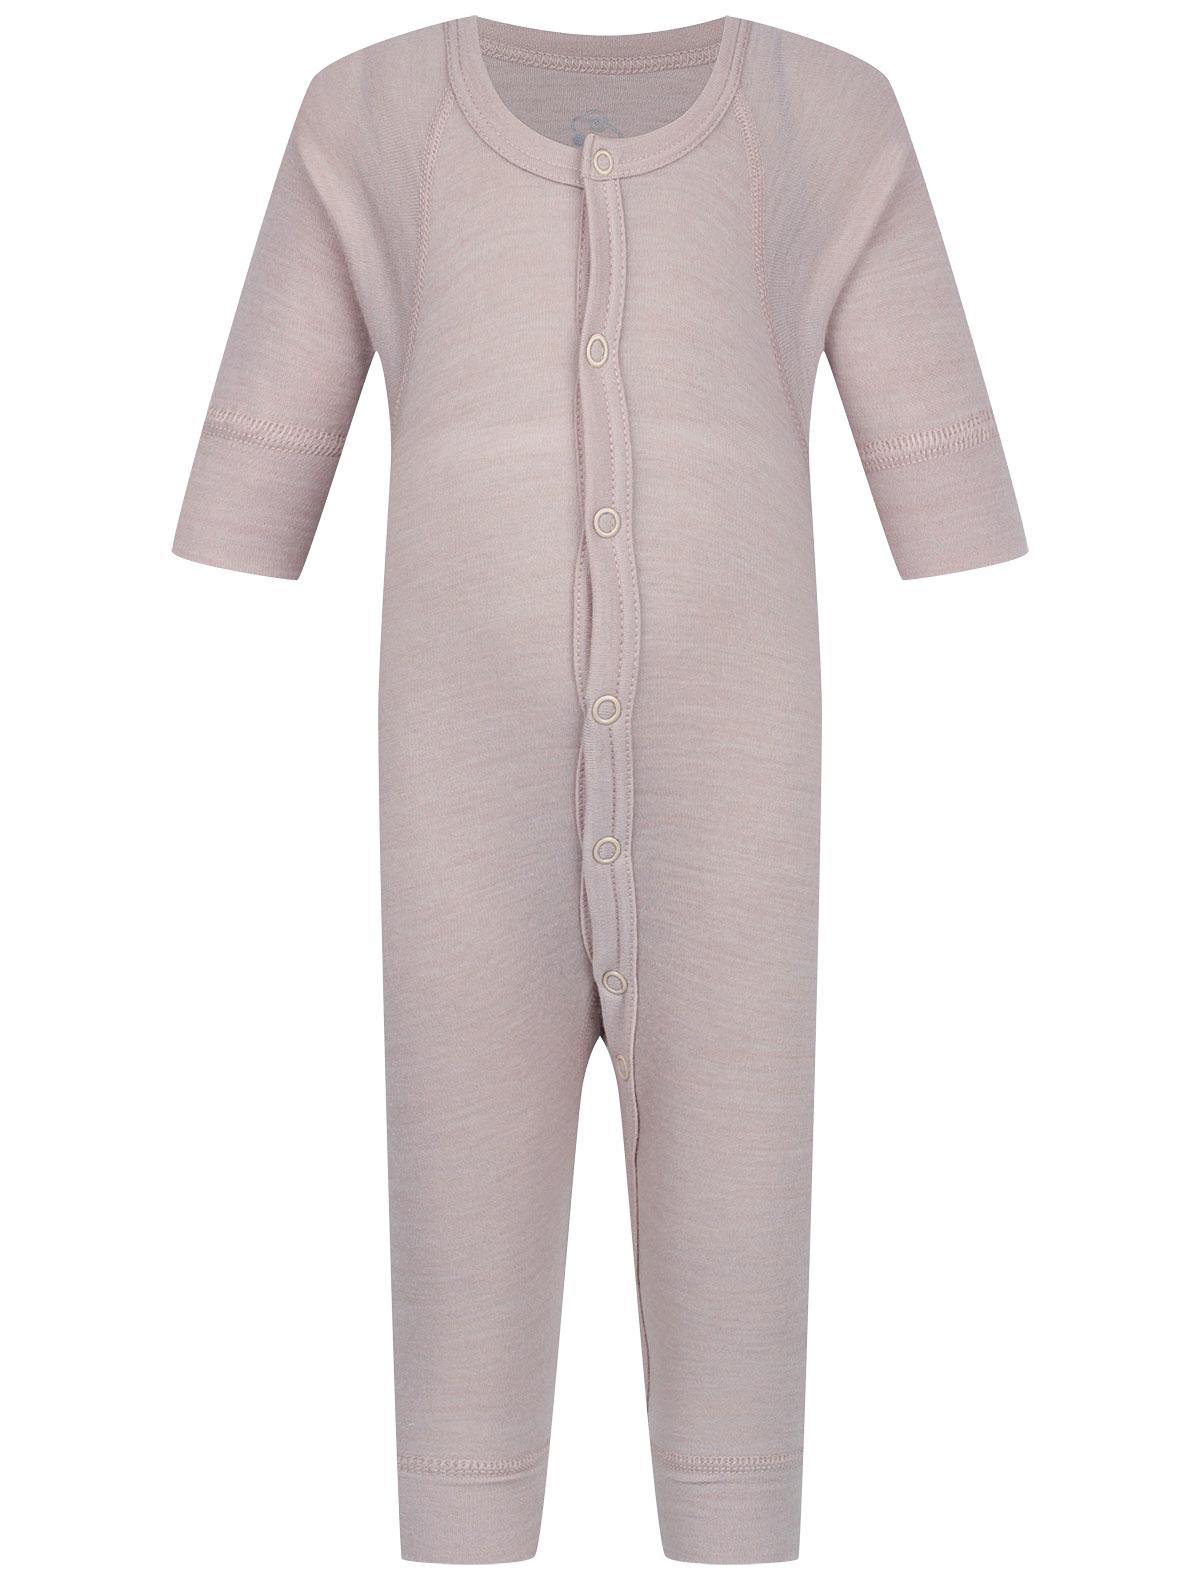 Купить 2249667, Комбинезон Air wool, бежевый, 1284529080548